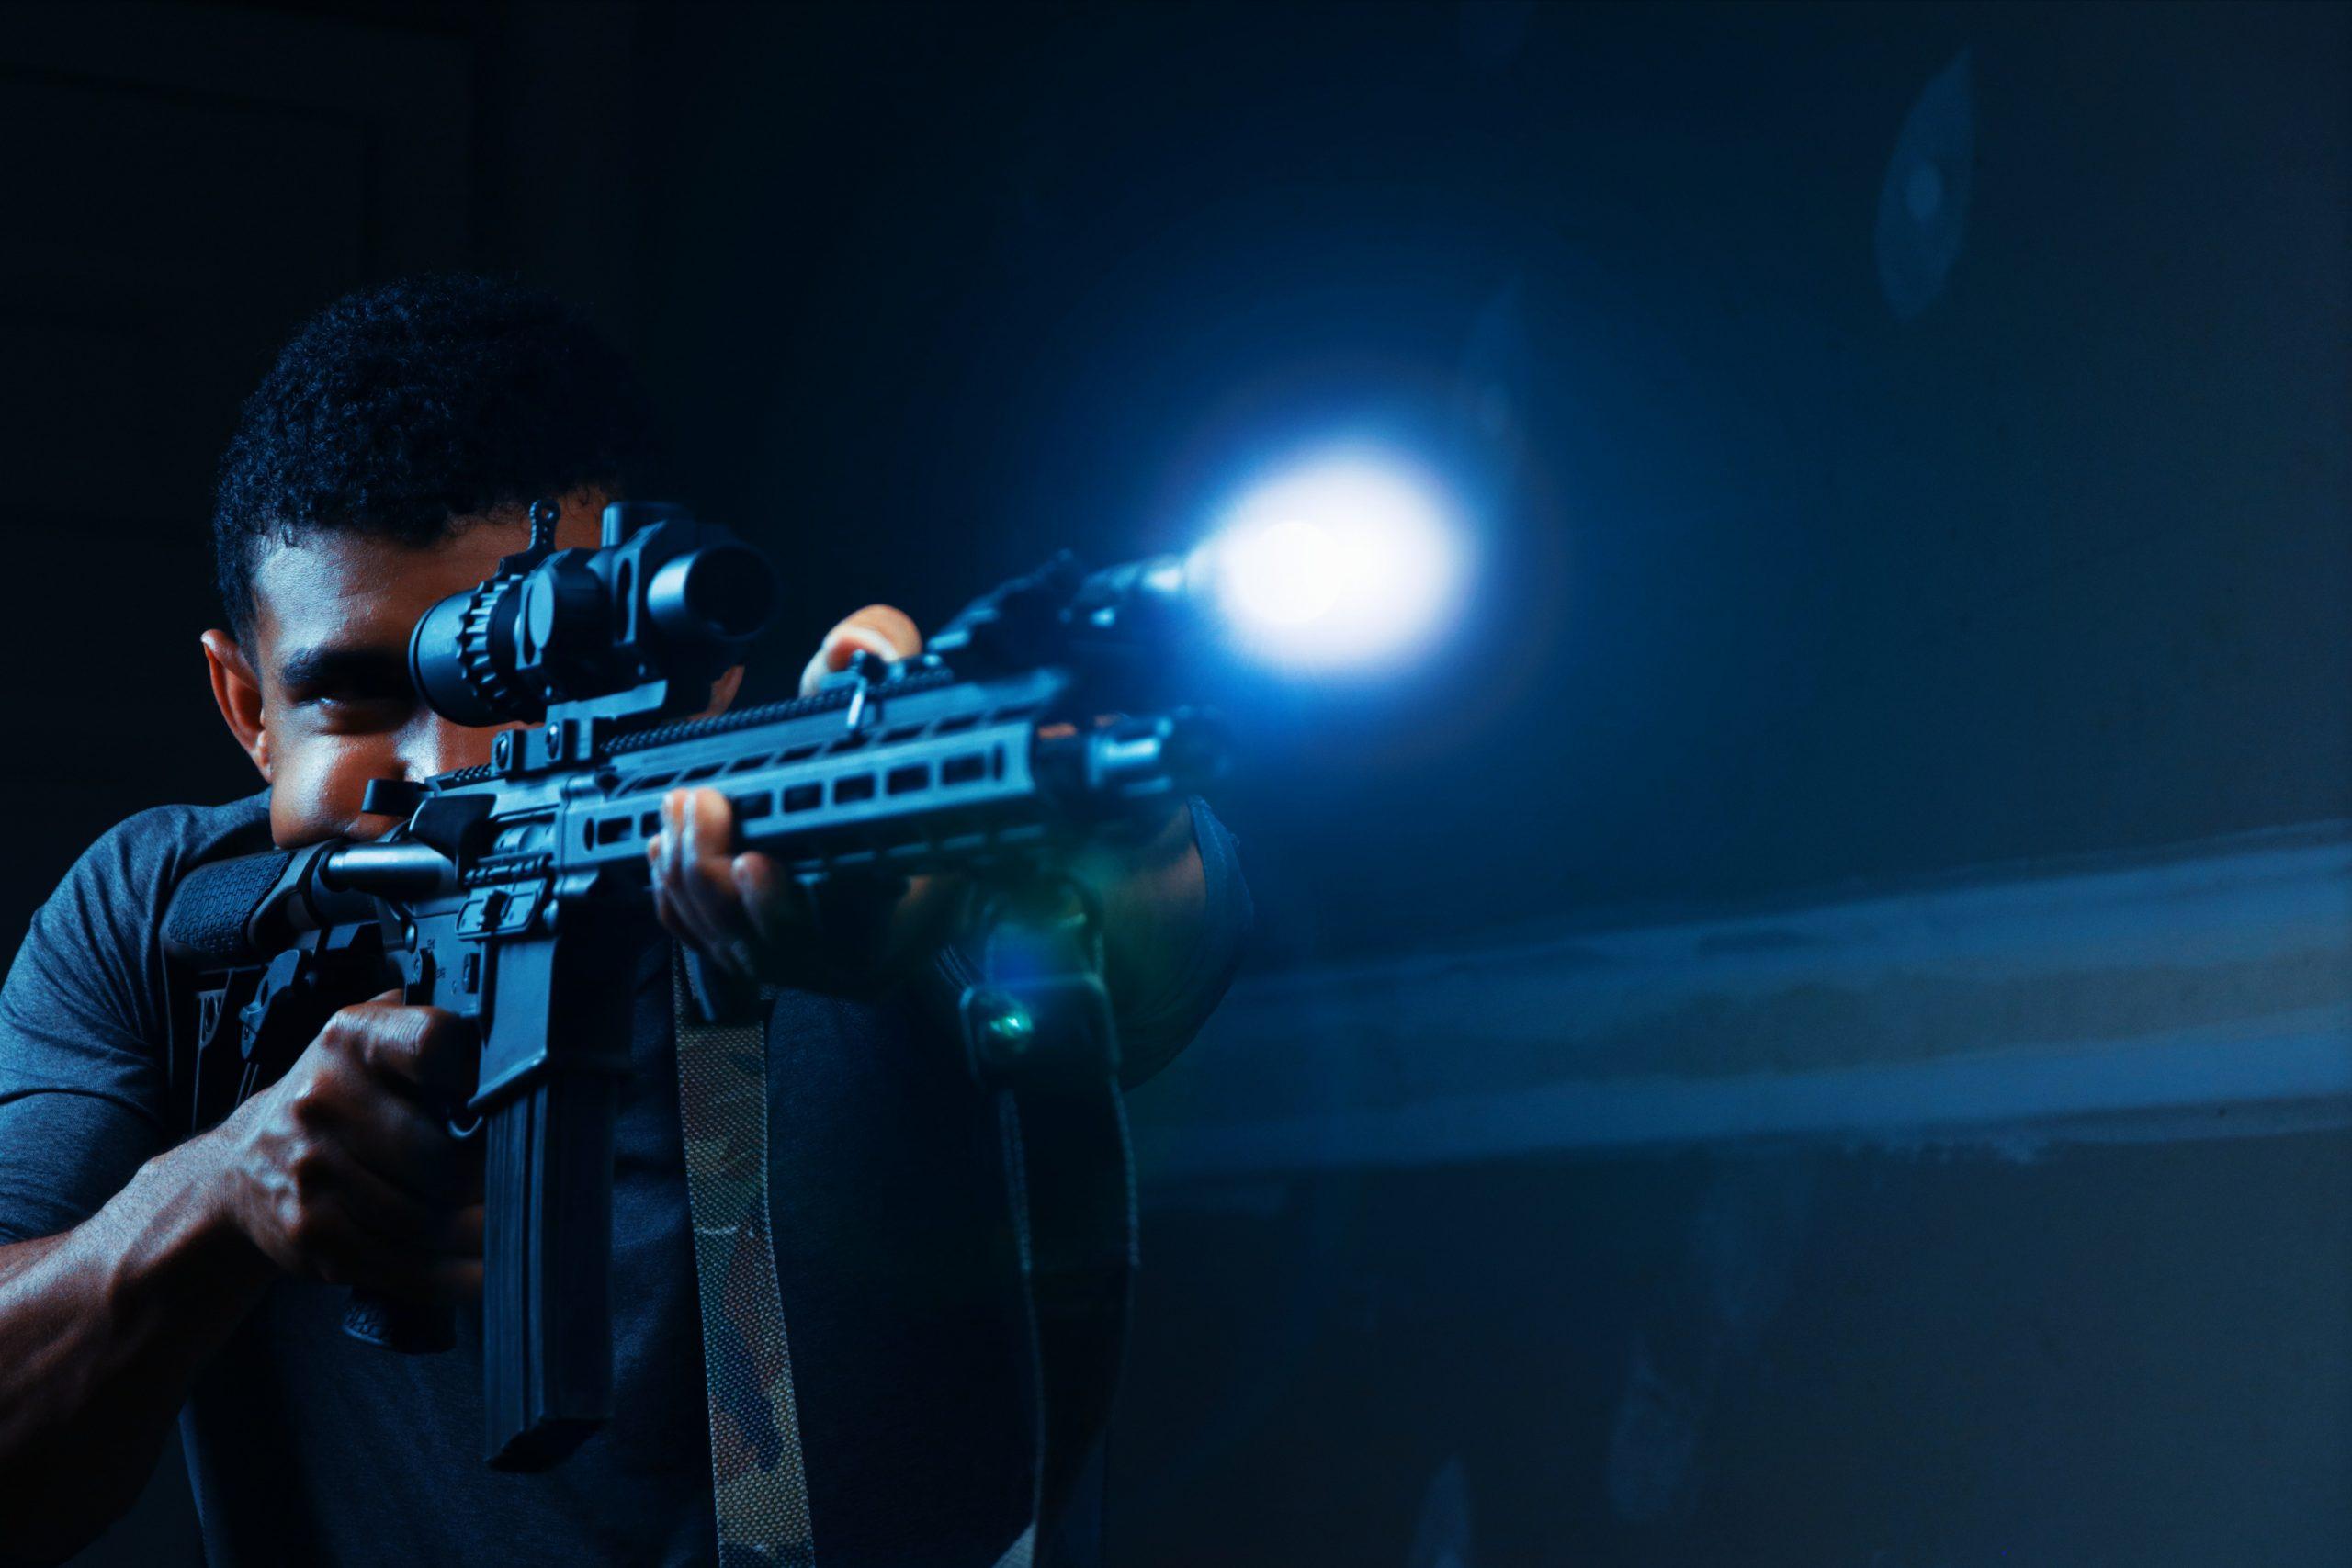 2020's Best AR-15 Grip Reviews